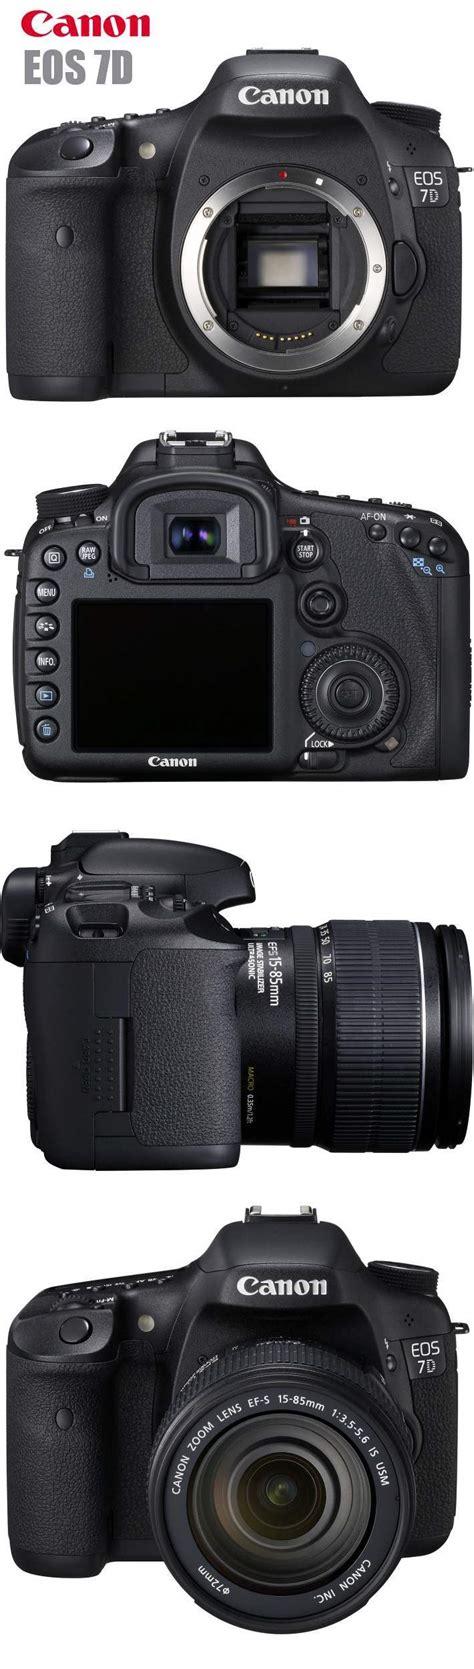 Kamera Canon Eos 7d Iii canon eos 7d 7d ii beschreibung fotos preisvergleich